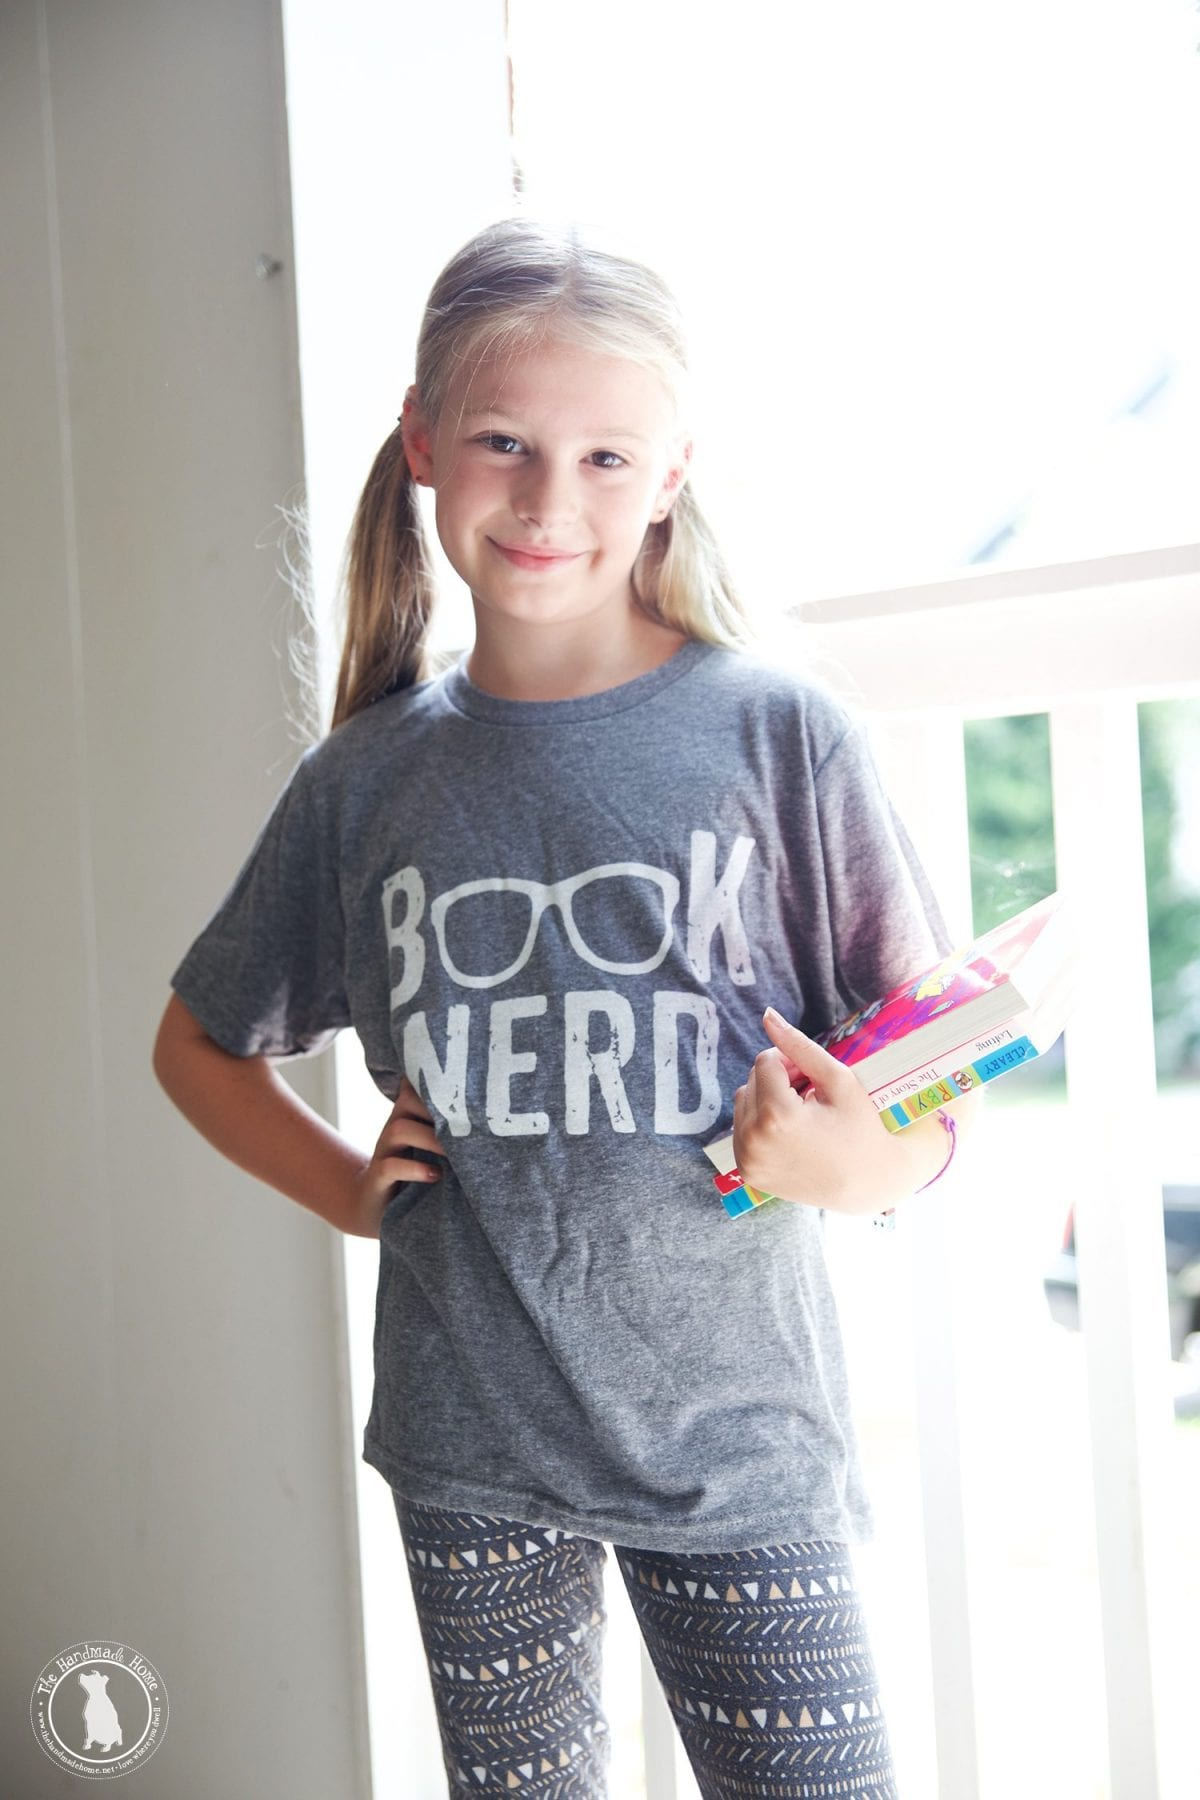 book_nerd_kids_tshirt